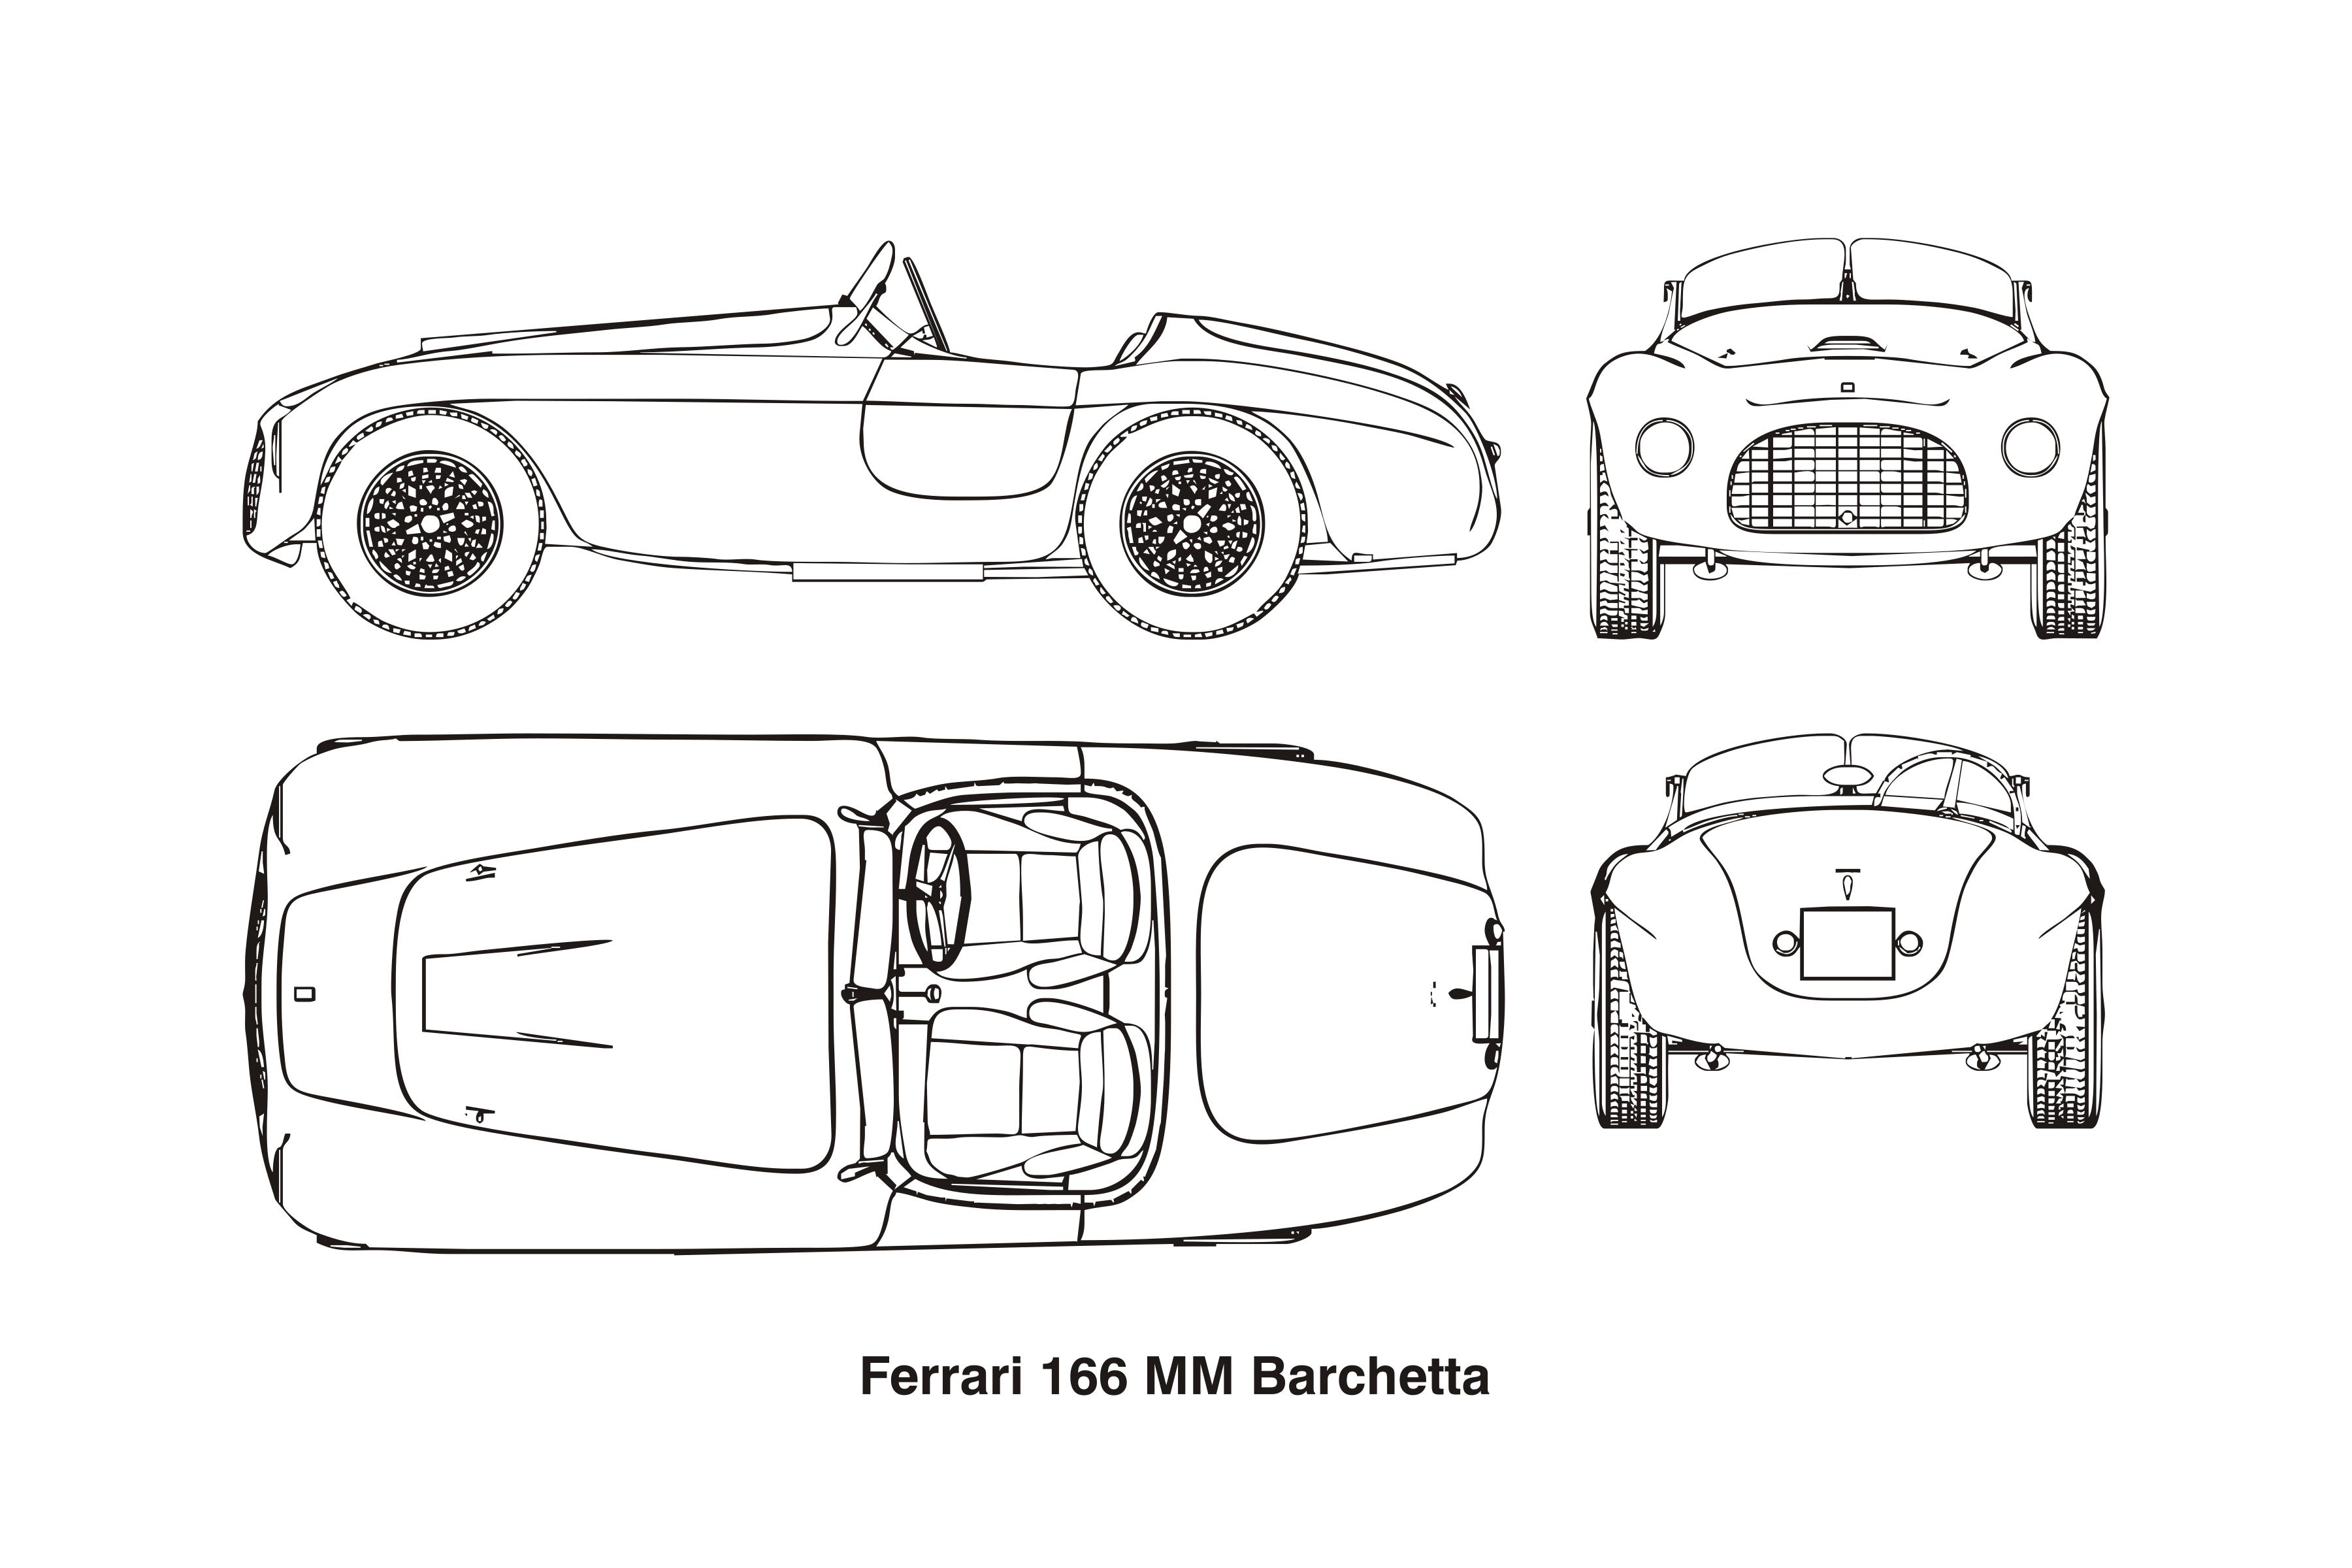 Ferrari 166 MM Barchetta, year 1948 Clipart.